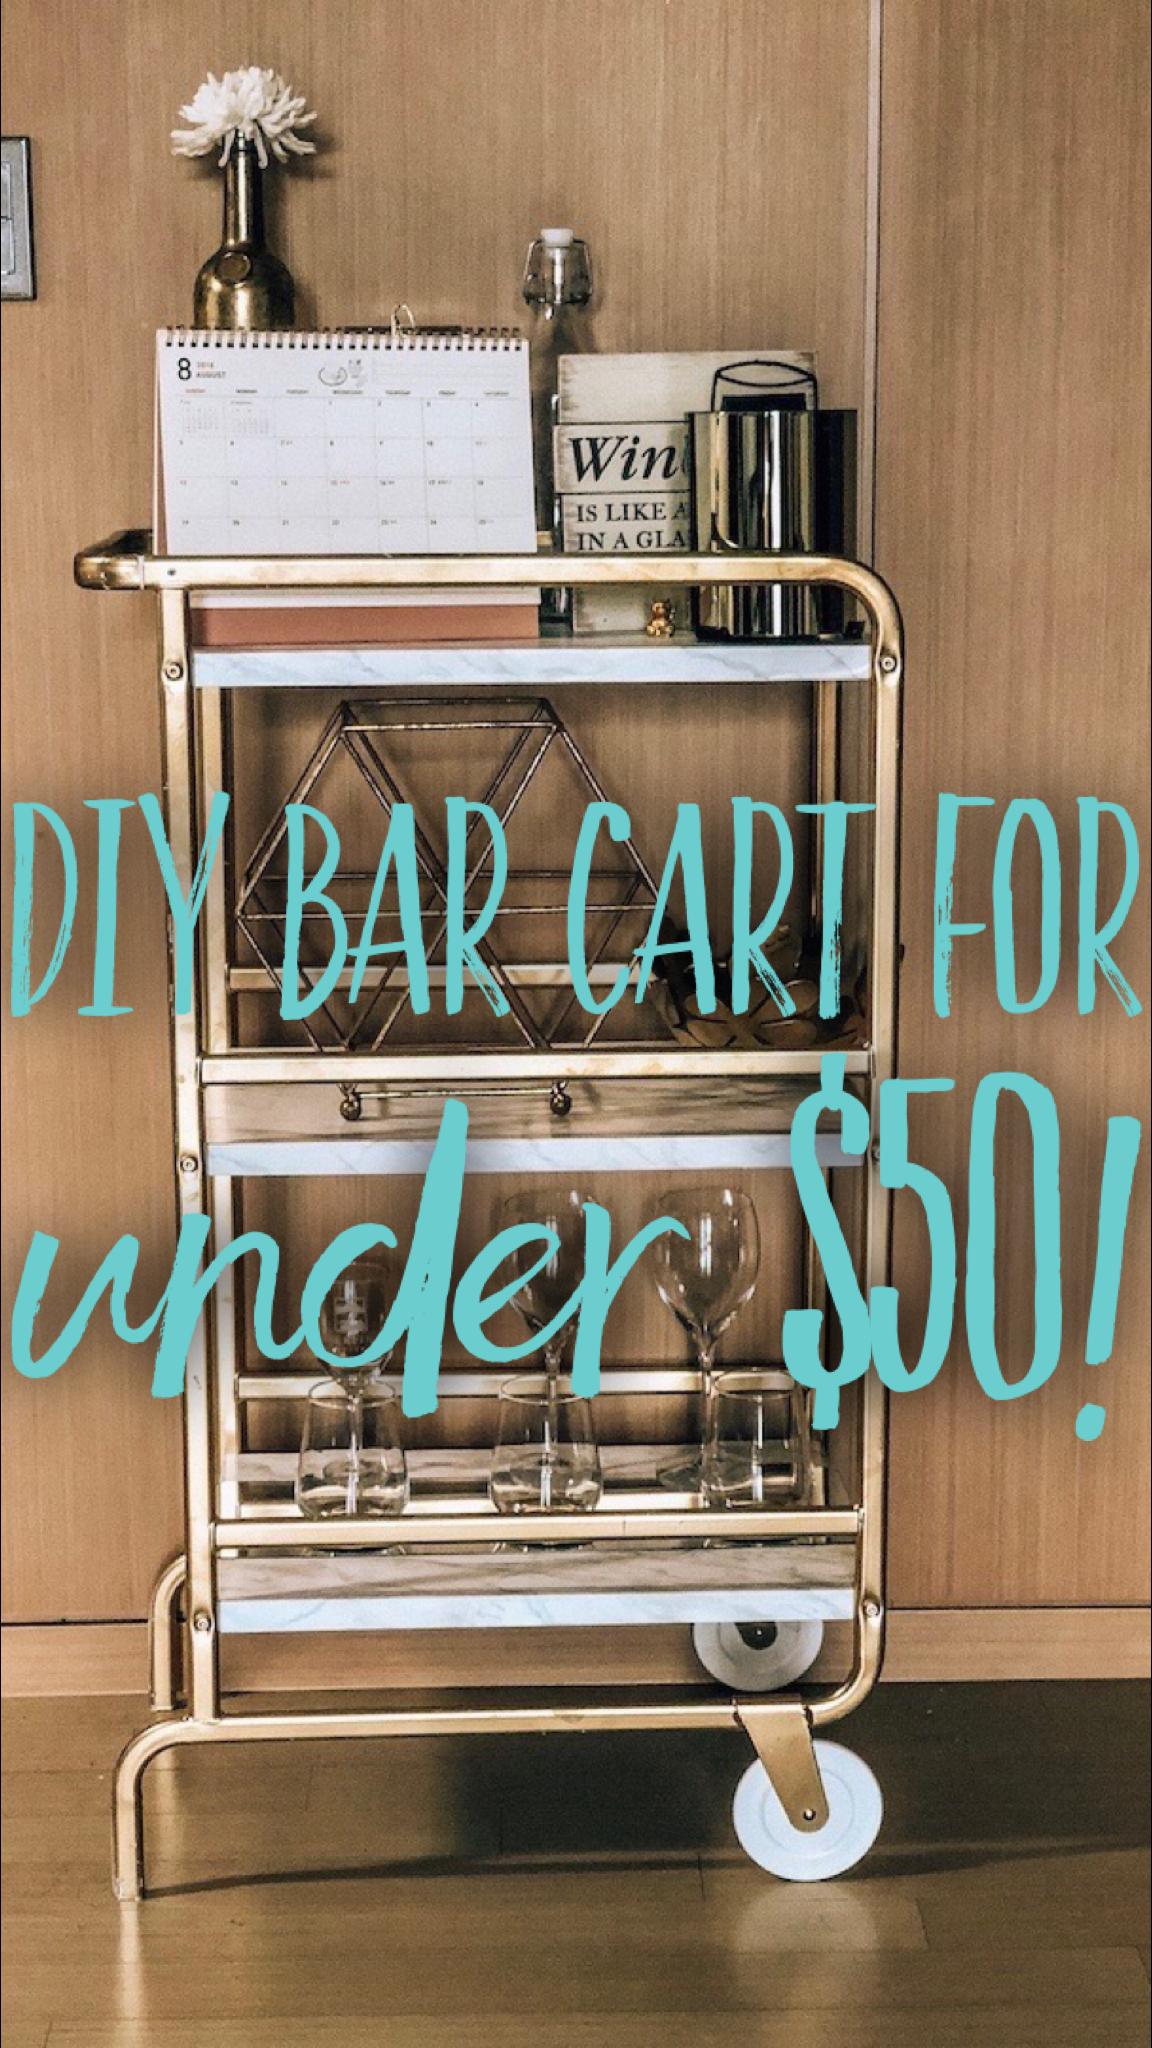 DIY Bar Cart for Under $50!